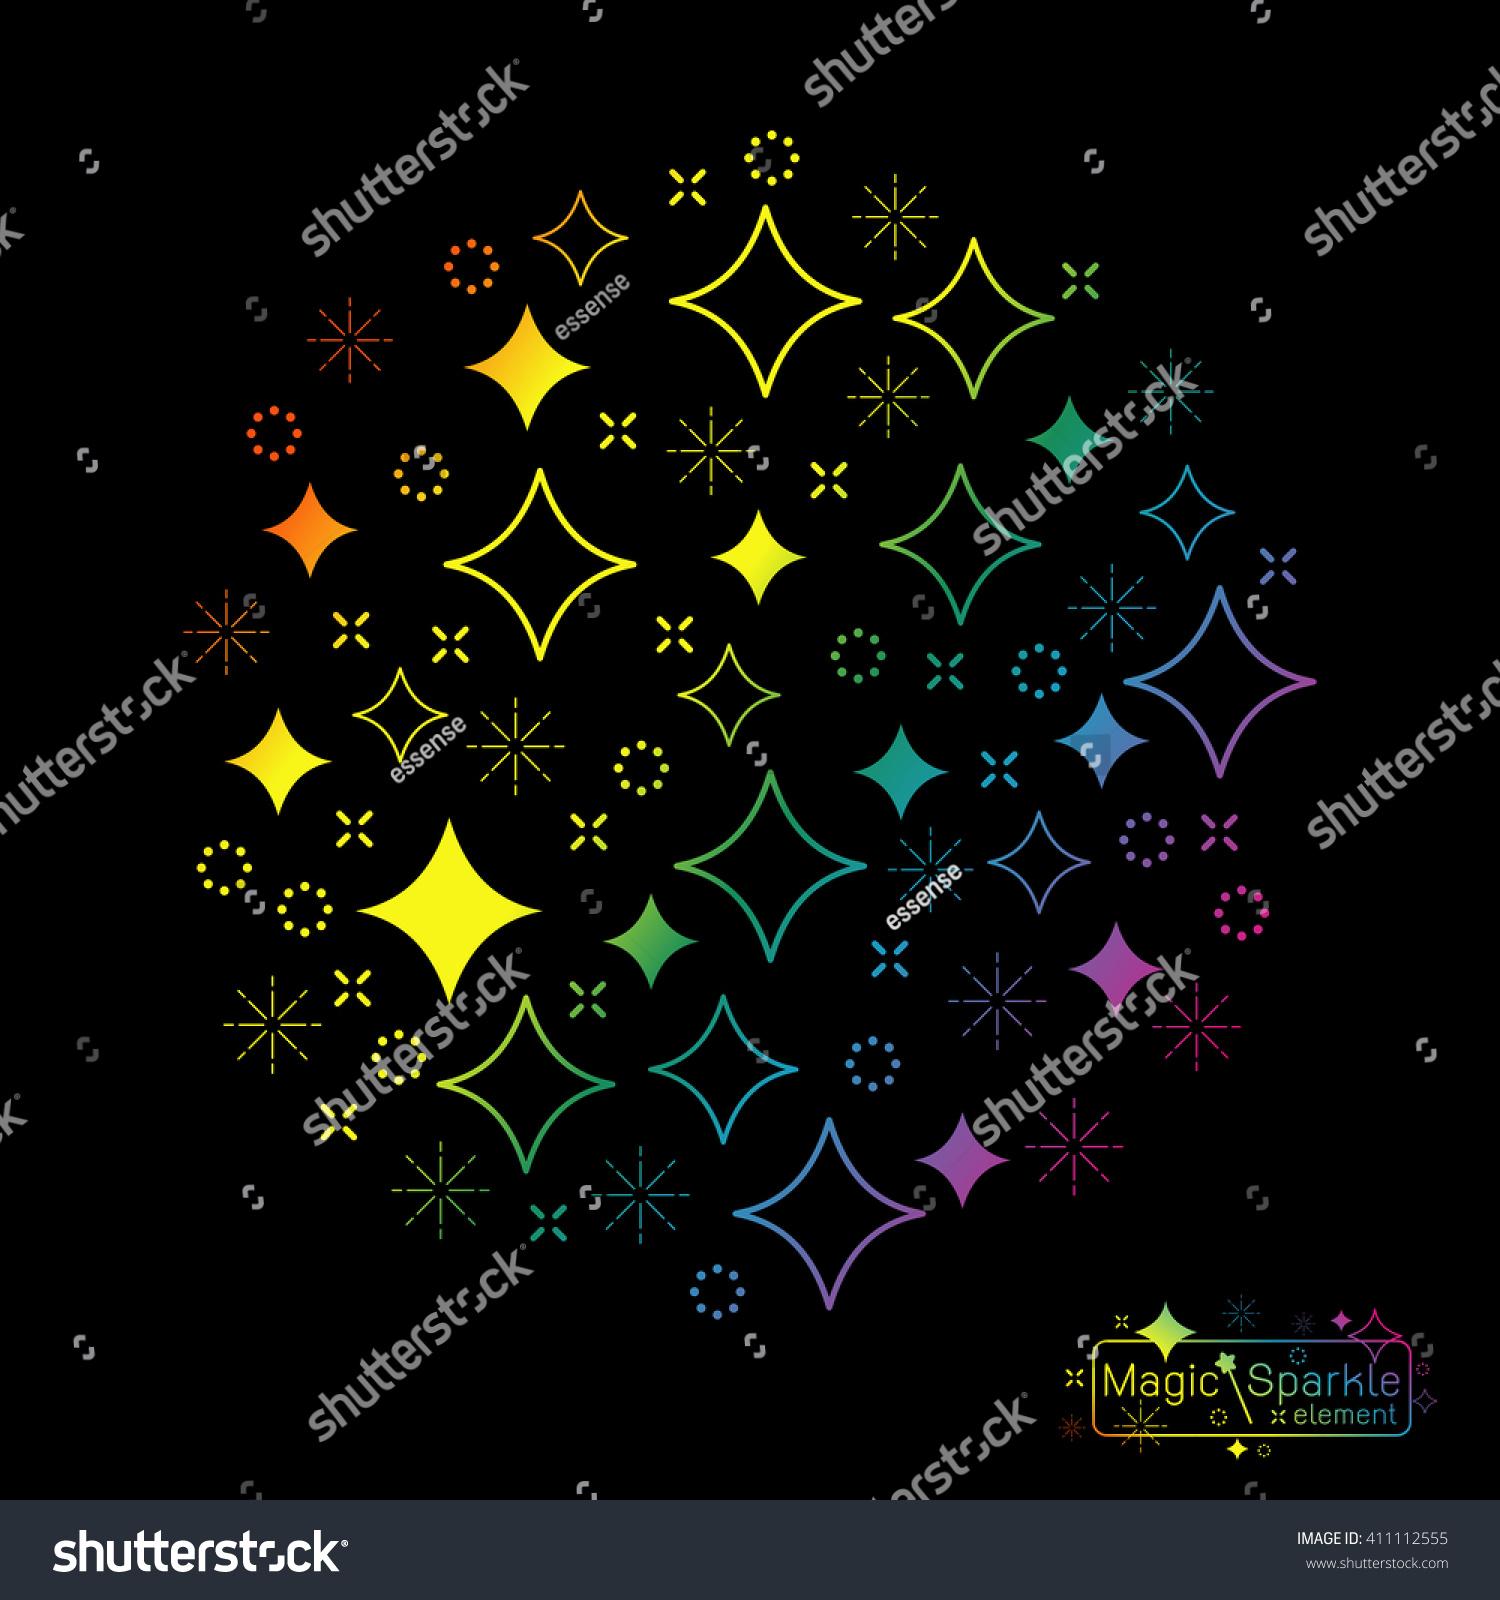 Set Magic Sparkle Wand Design Elements Stock Vector 411112555 ...